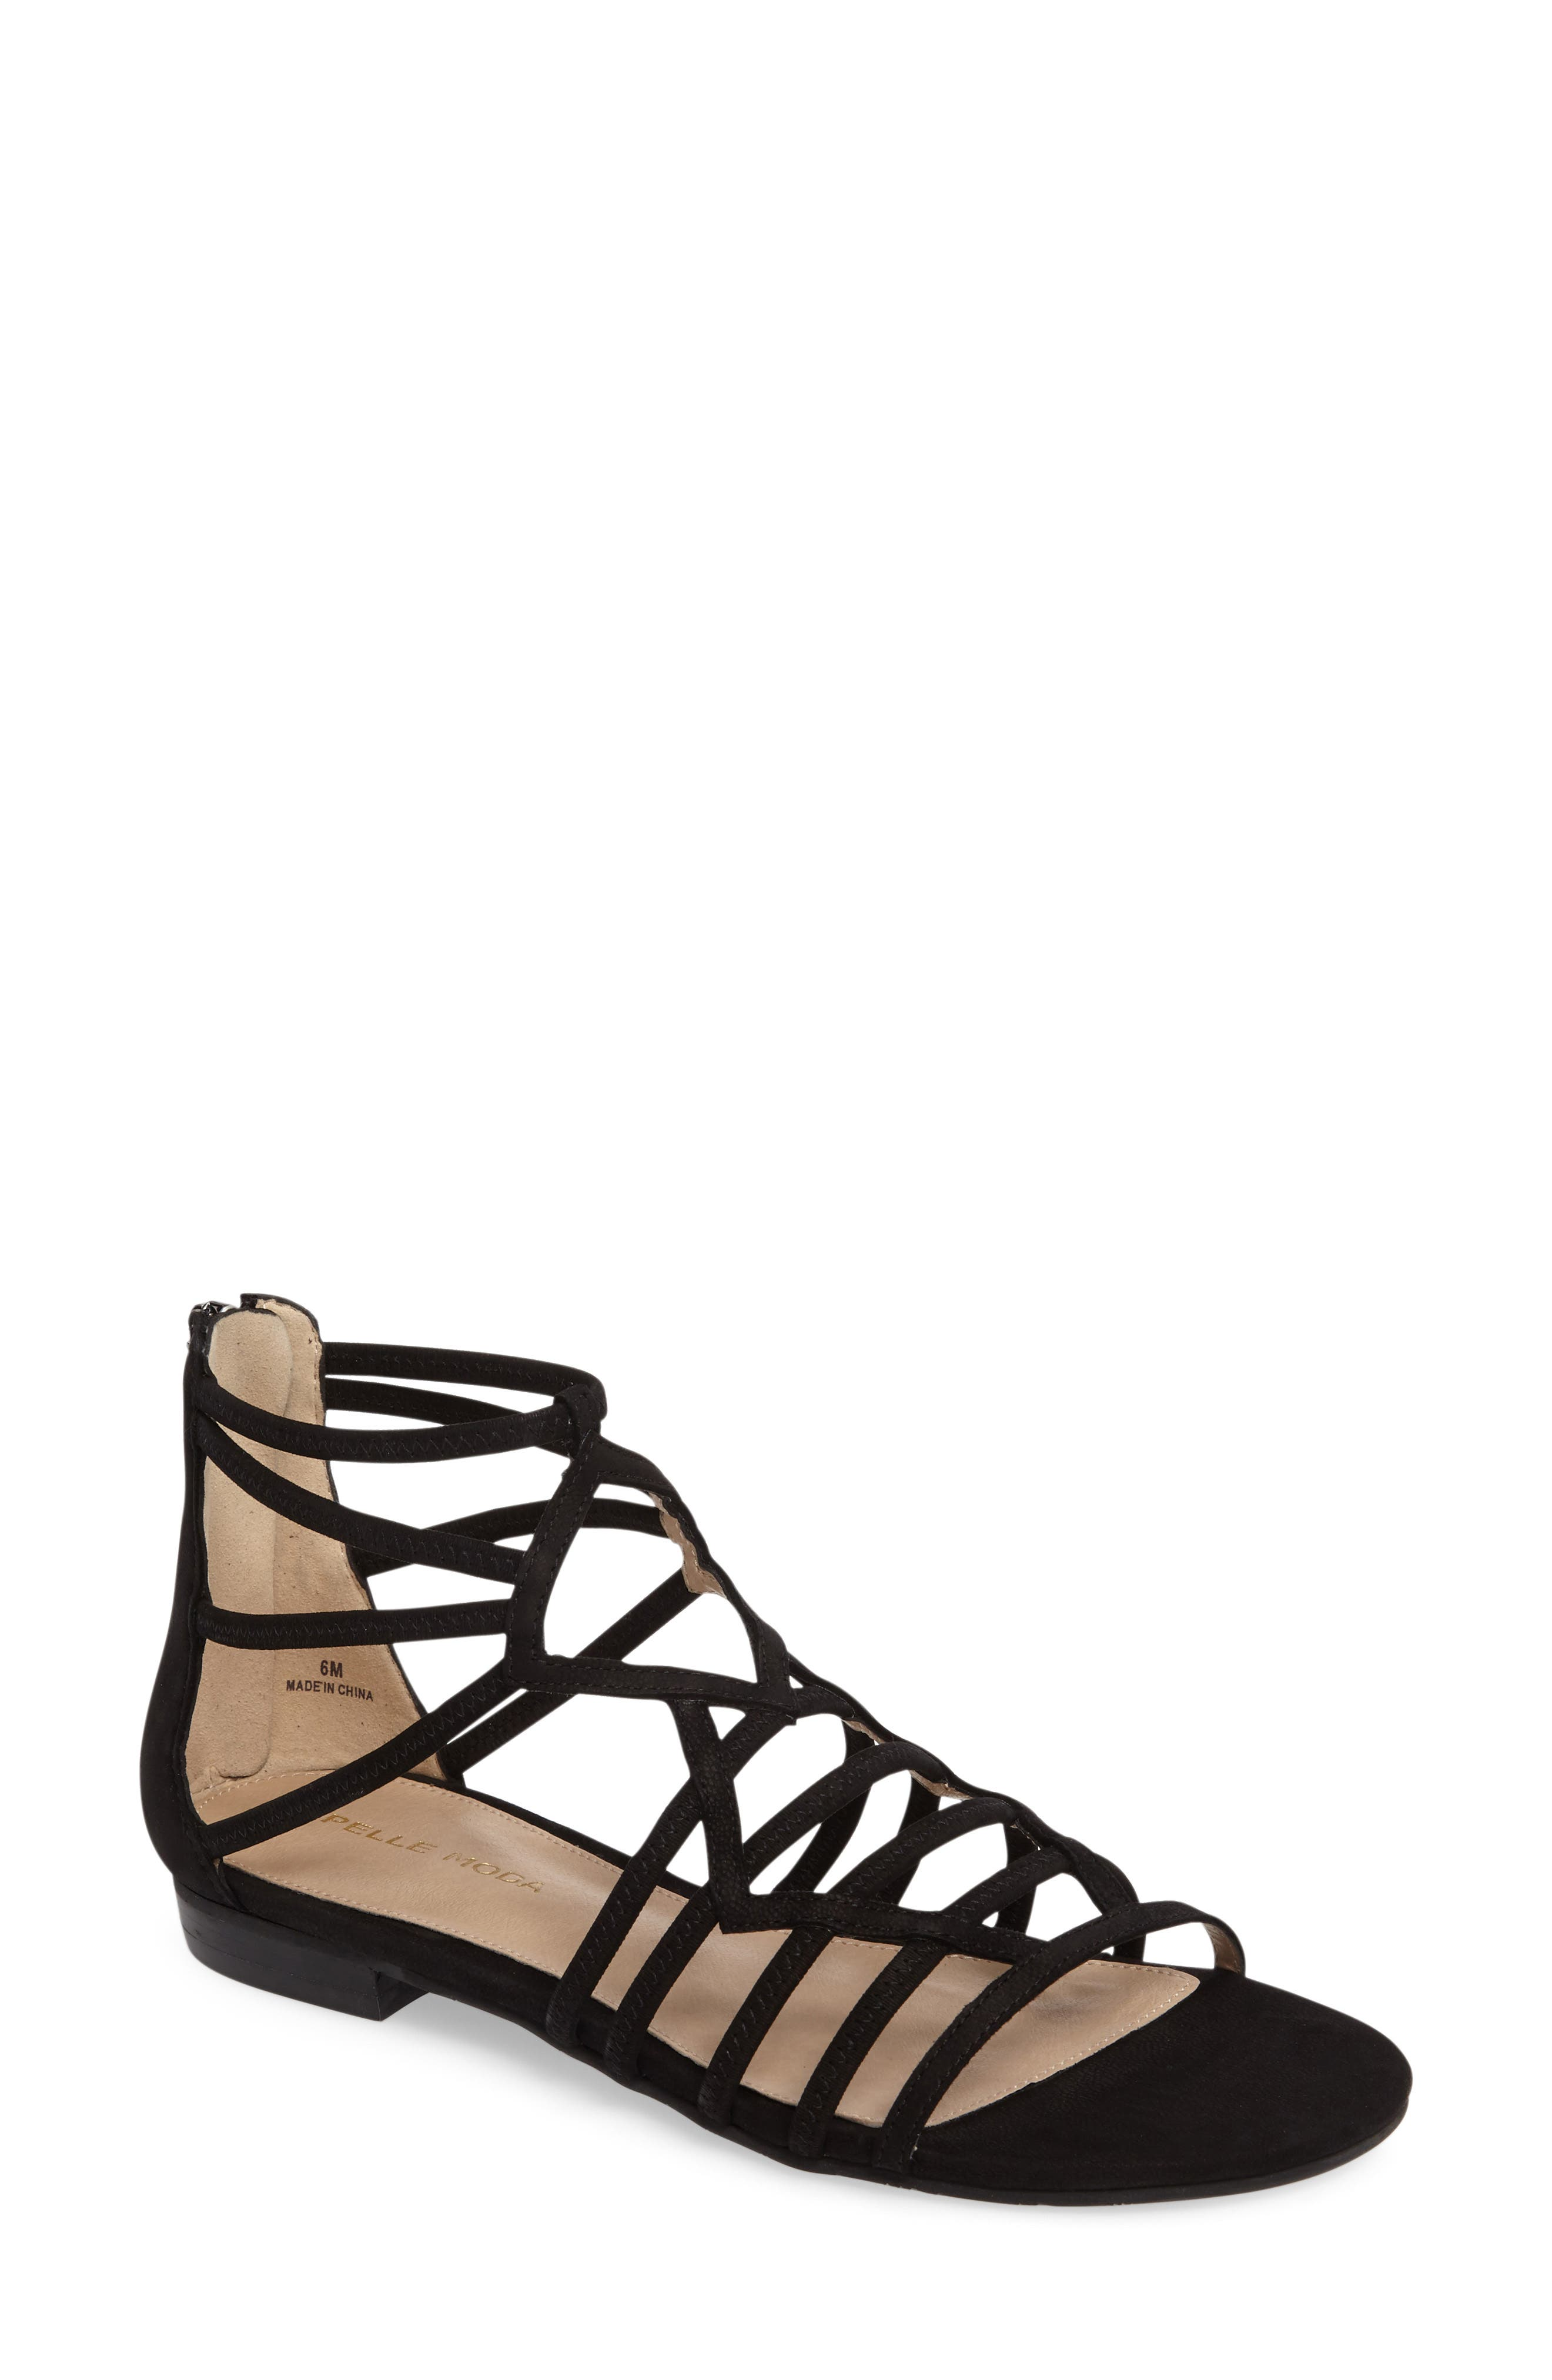 Pelle Moda Brazil Strappy Sandal (Women)